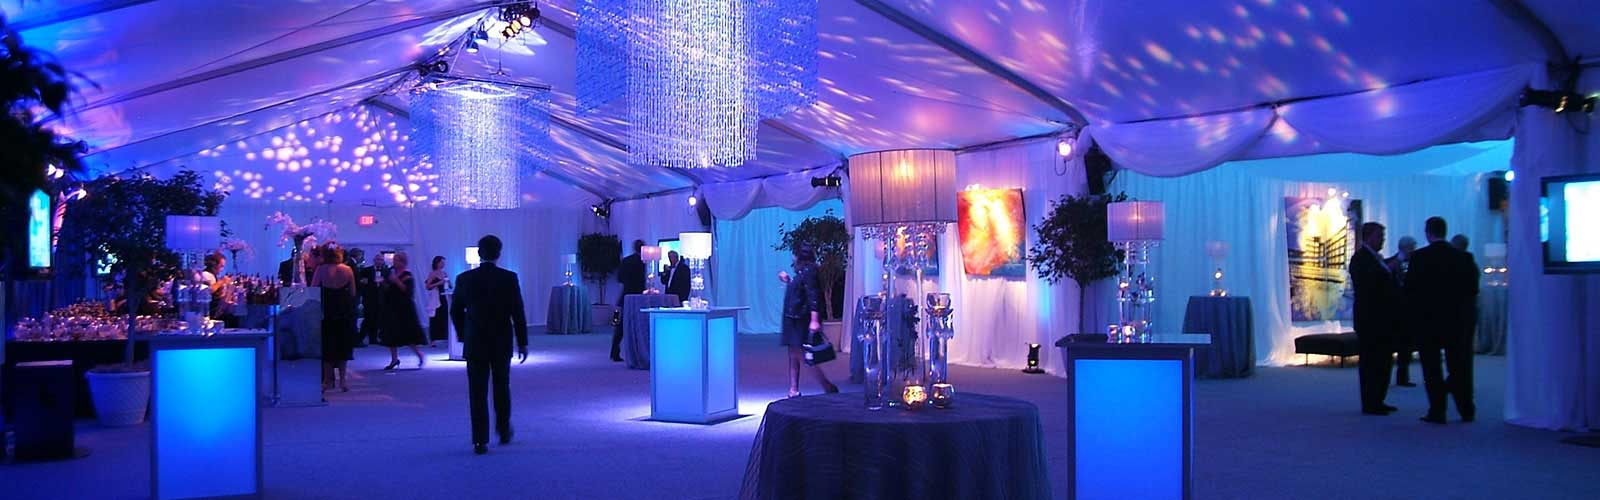 Party Rentals Murfreesboro Tn Event Rentals In